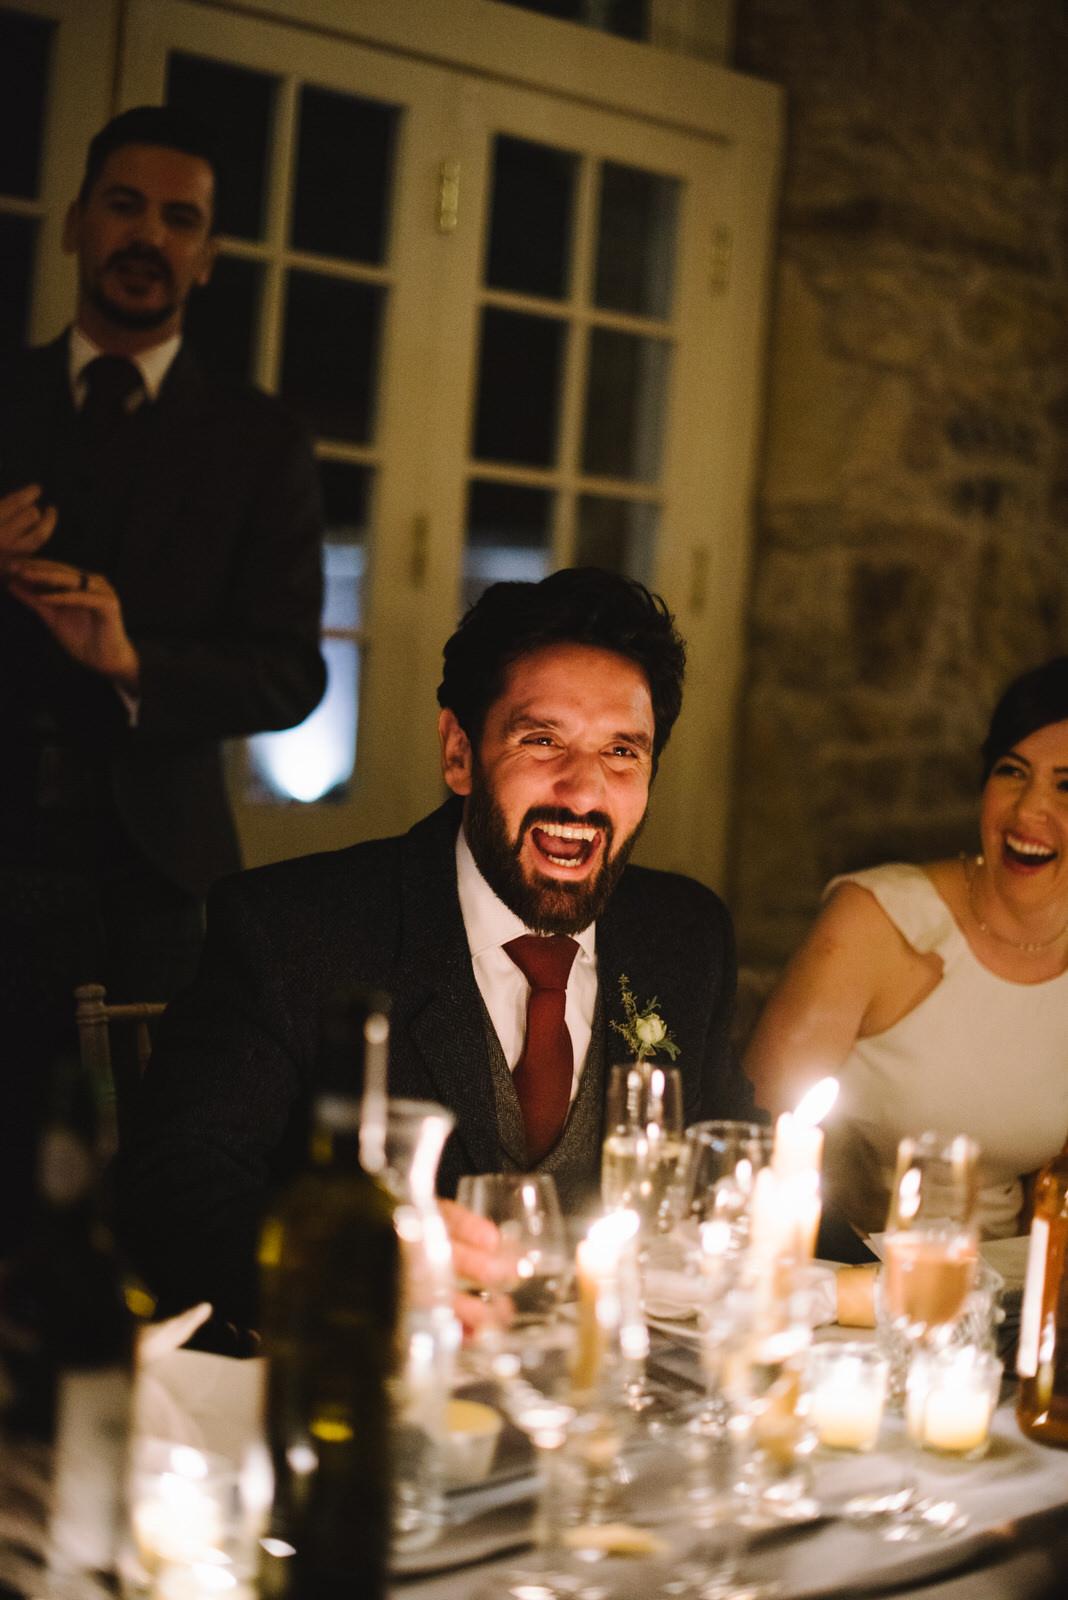 039-COLSTOUN-HOUSE-WEDDING-ALTERNATIVE-WEDDING-PHOTOGRAPHER-GLASGOW-WEDDING-PHOTOGRAPHER-STYLISH-SCOTTISH-WEDDING.JPG